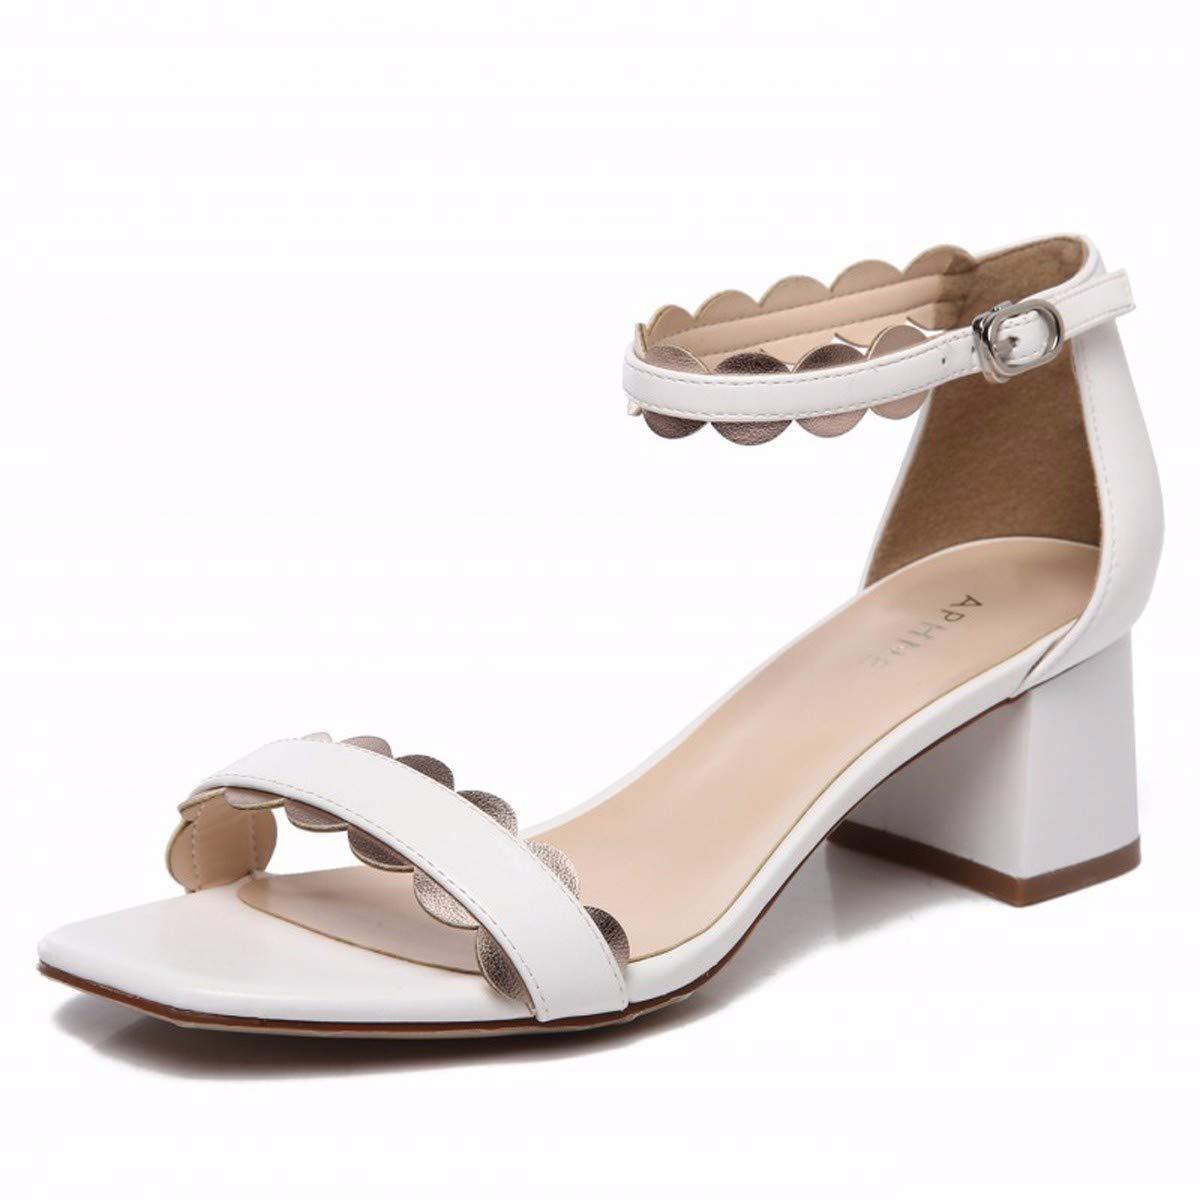 KOKQSX-Sandalen Schnallen Schuhe medium - 5cm rau bei Square Kopf Sandalen 38 weiße